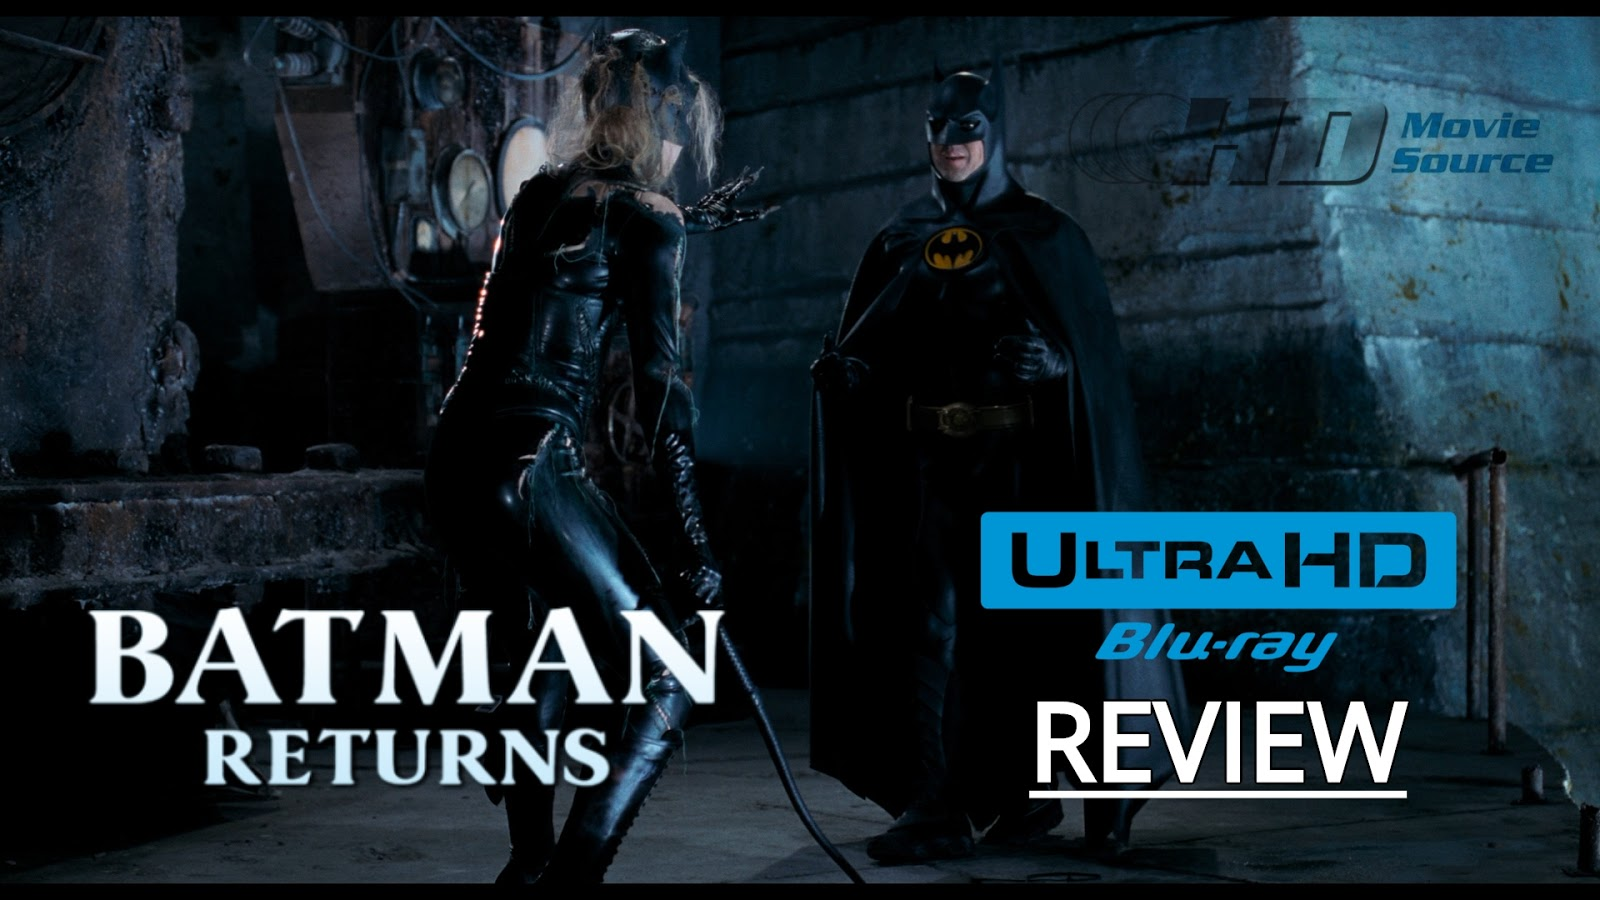 batman returns blu ray review